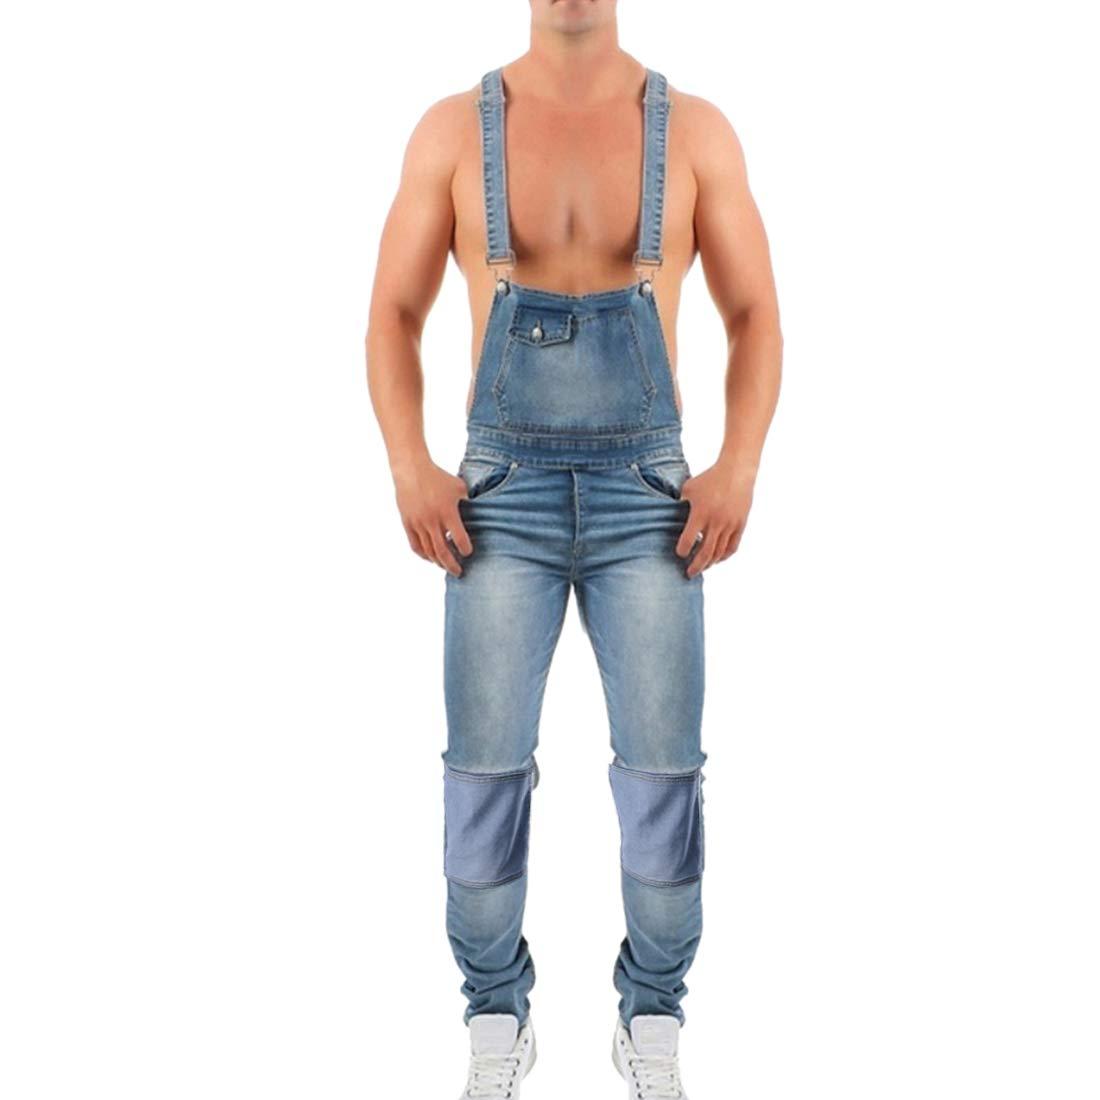 Shujin Herren Retro Lange Jeans Latzhose Denim Overalls Skinny Fit Stone-Washed zerrei/ßen Arbeitshosen Jumpsuit